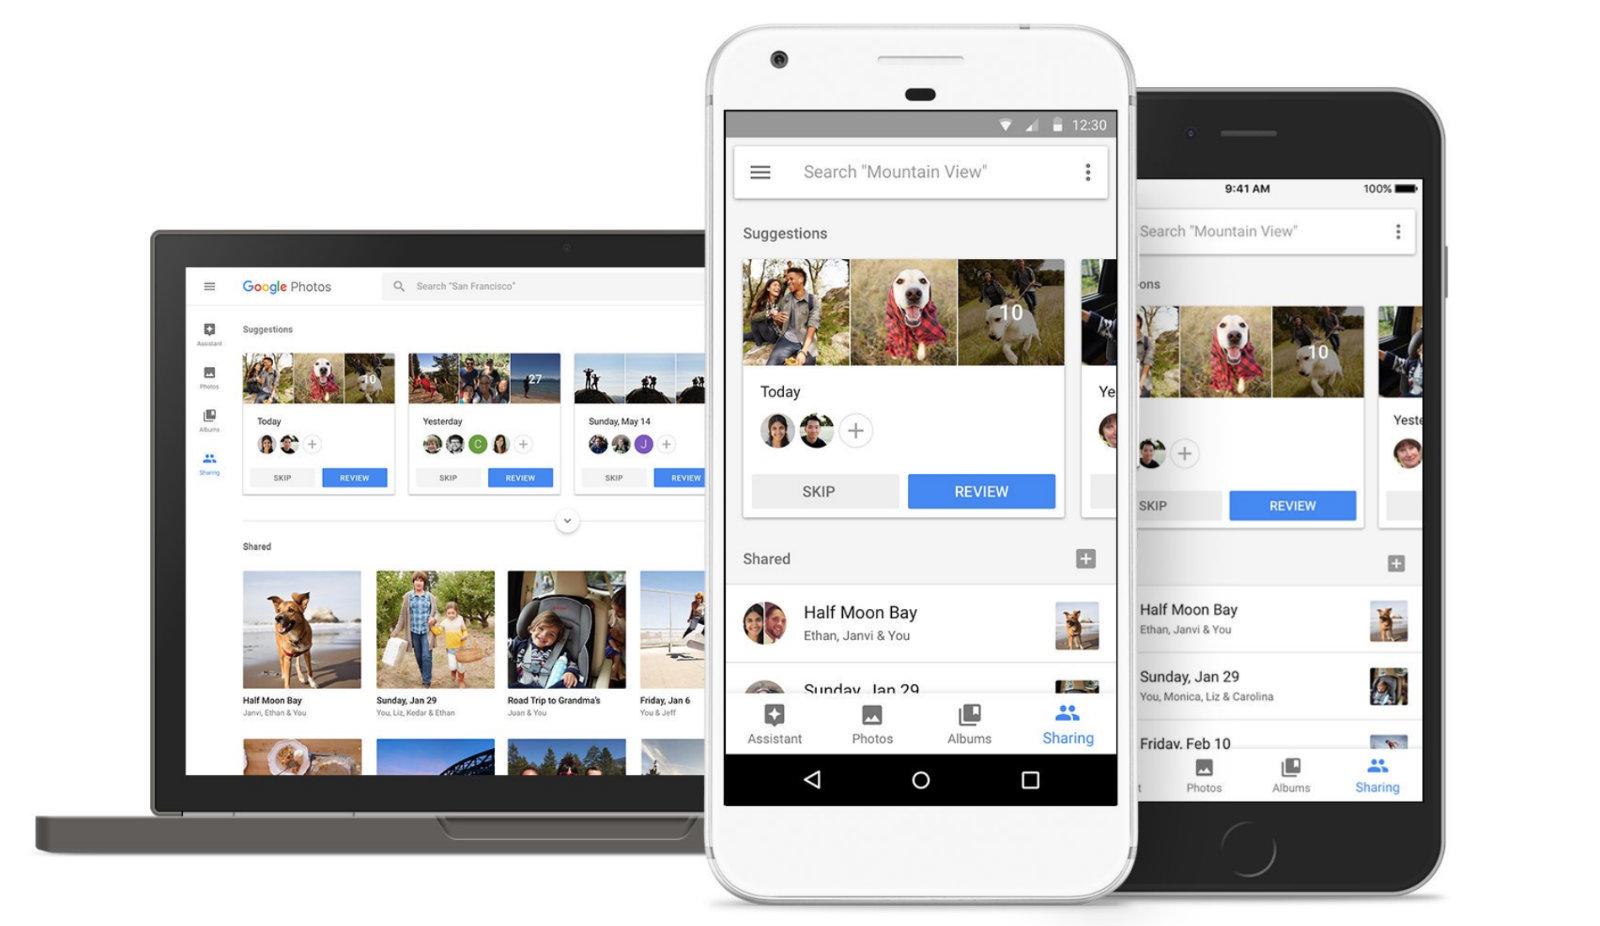 Google Photoes - تطبيق Google Photos يسمح لك بمشاركة الفيديوهات حتي عند بطئ الإنترنت